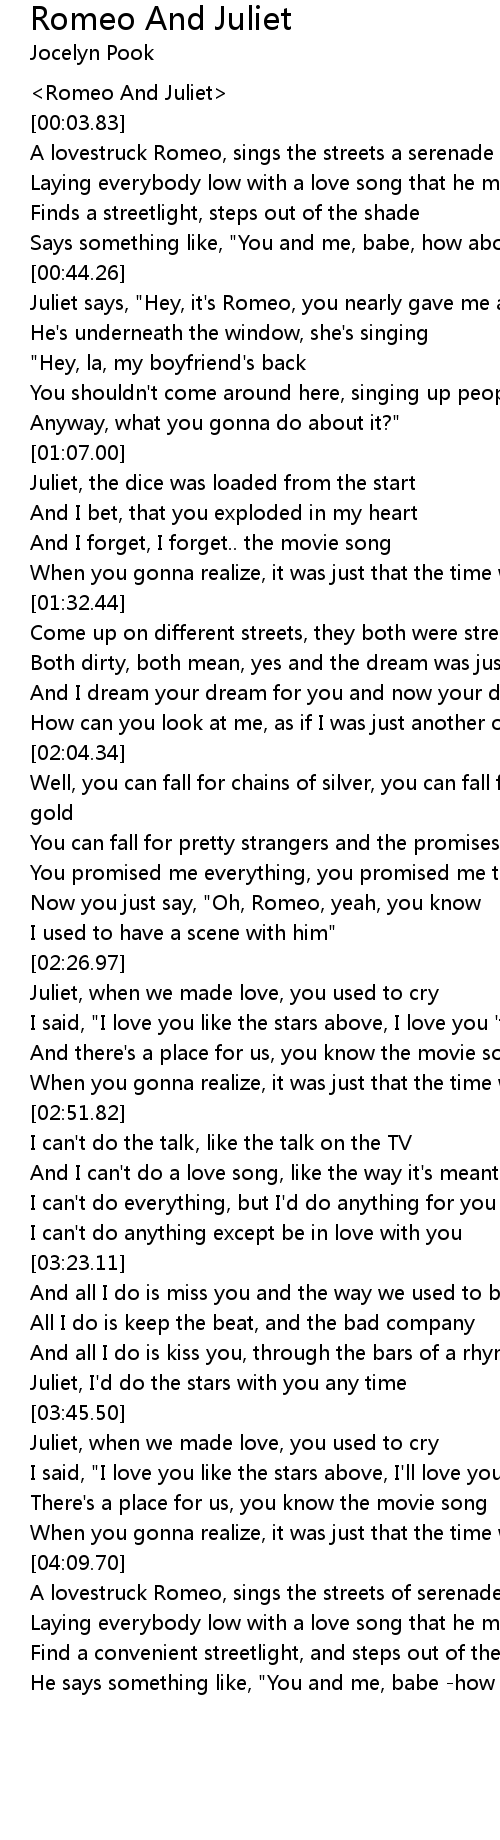 Romeo And Juliet Lyrics Follow Lyrics